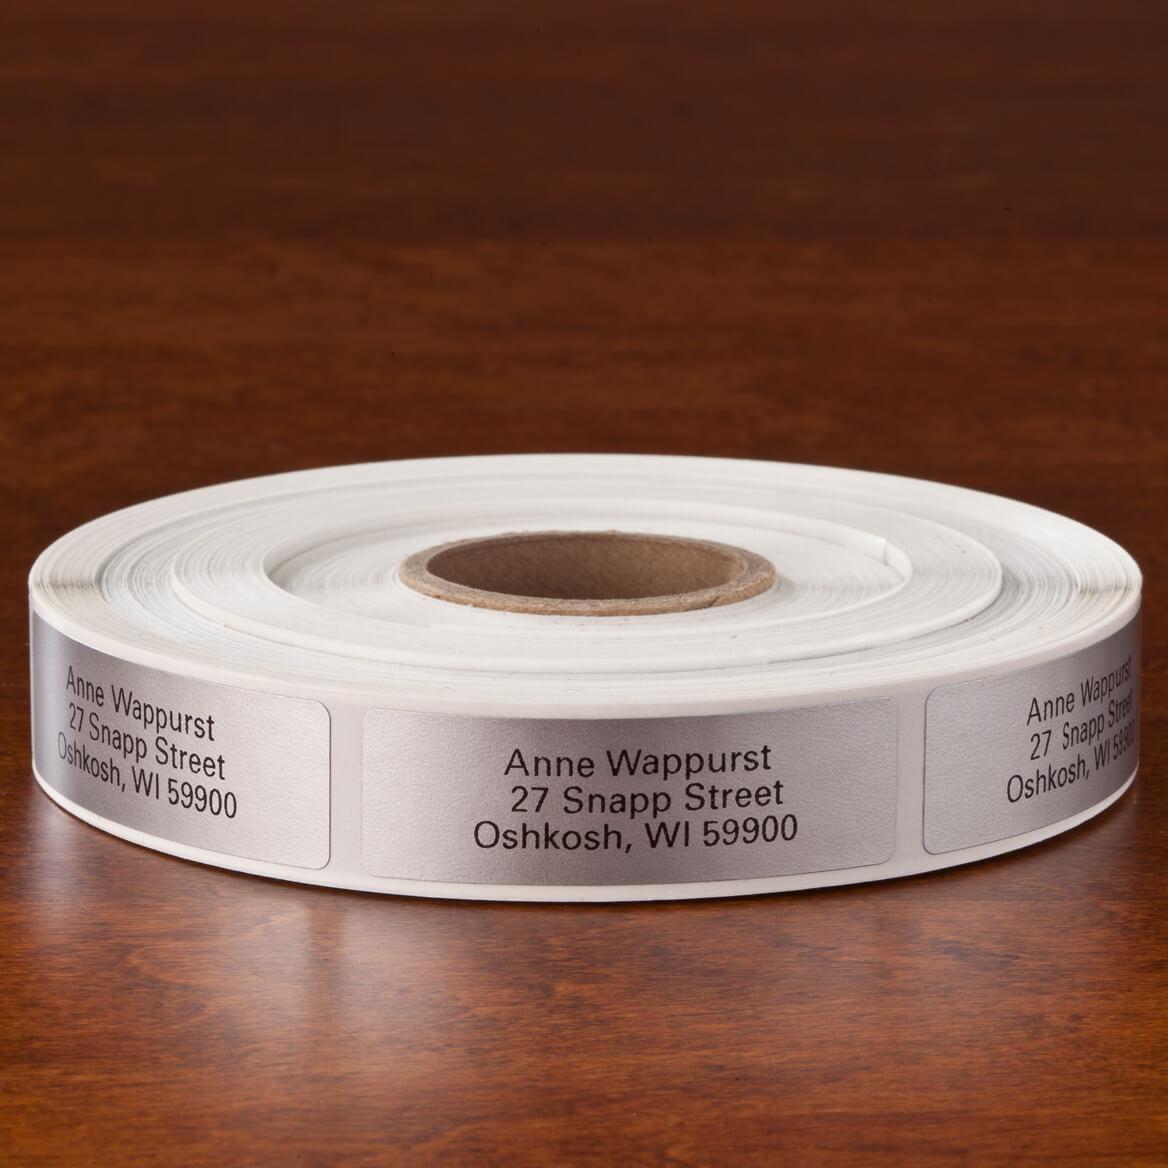 Self Stick Address Labels - Roll of 1000-310881